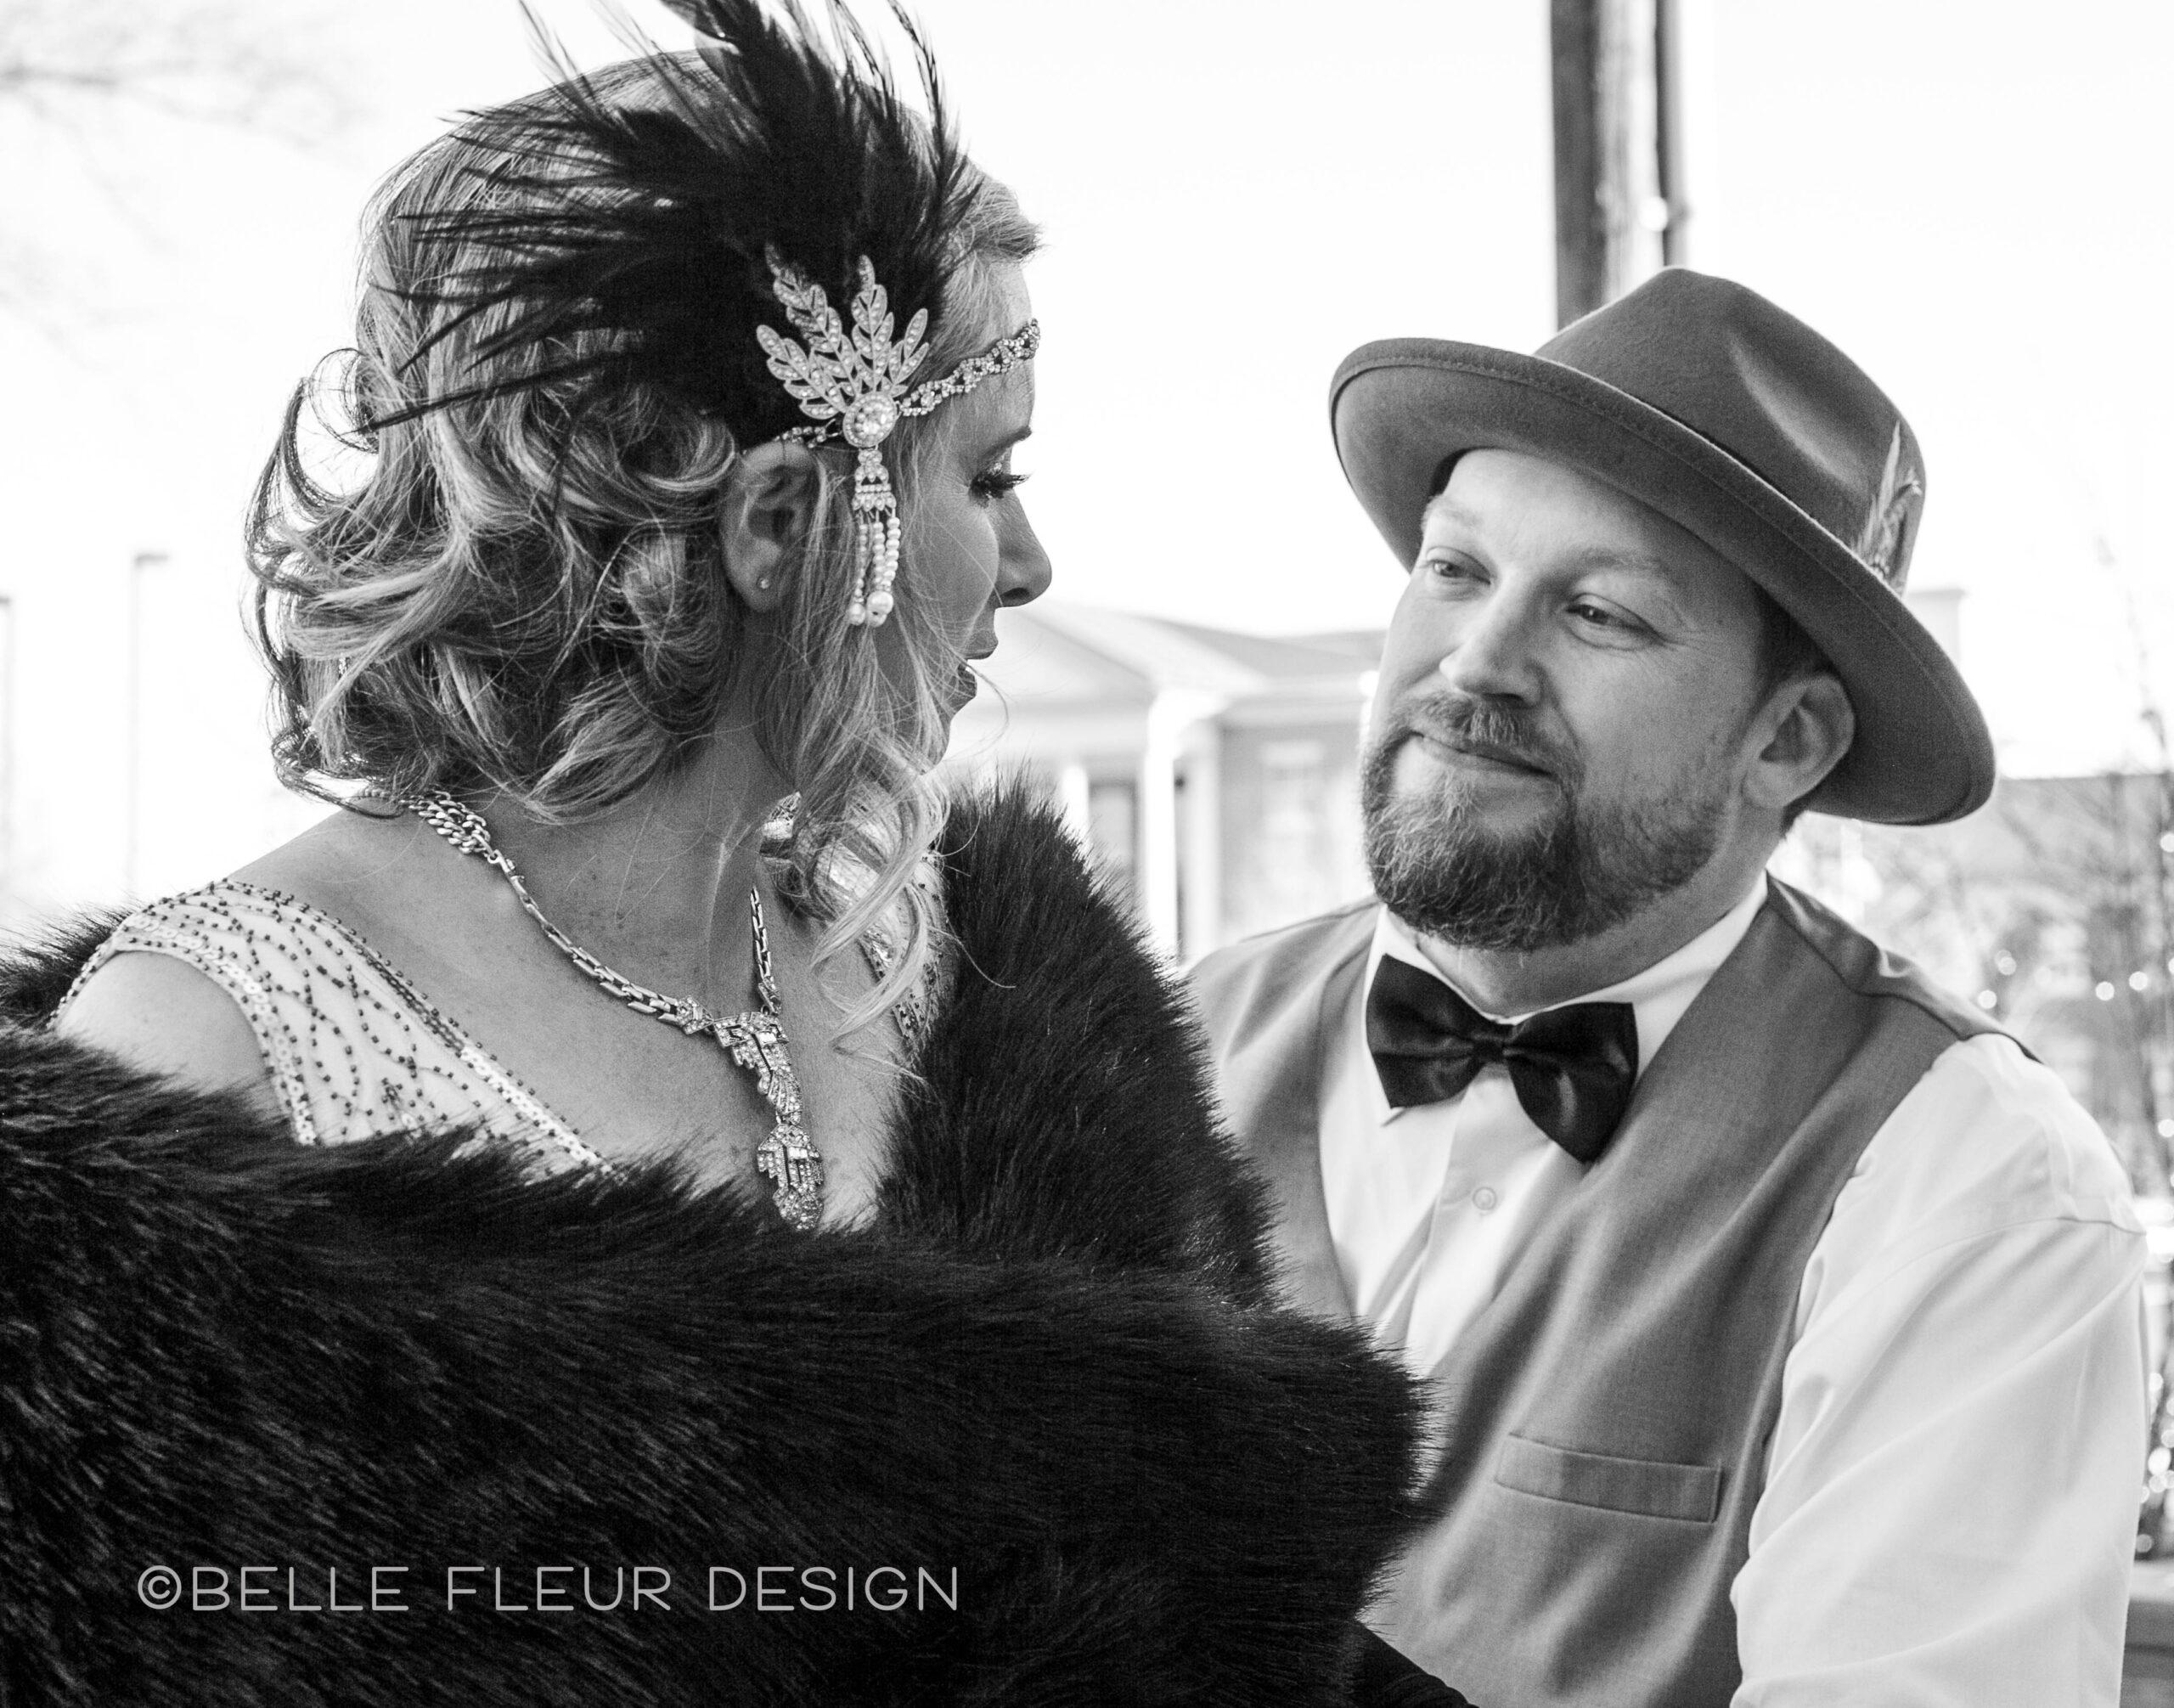 Belle Fleur Design Custom Photography